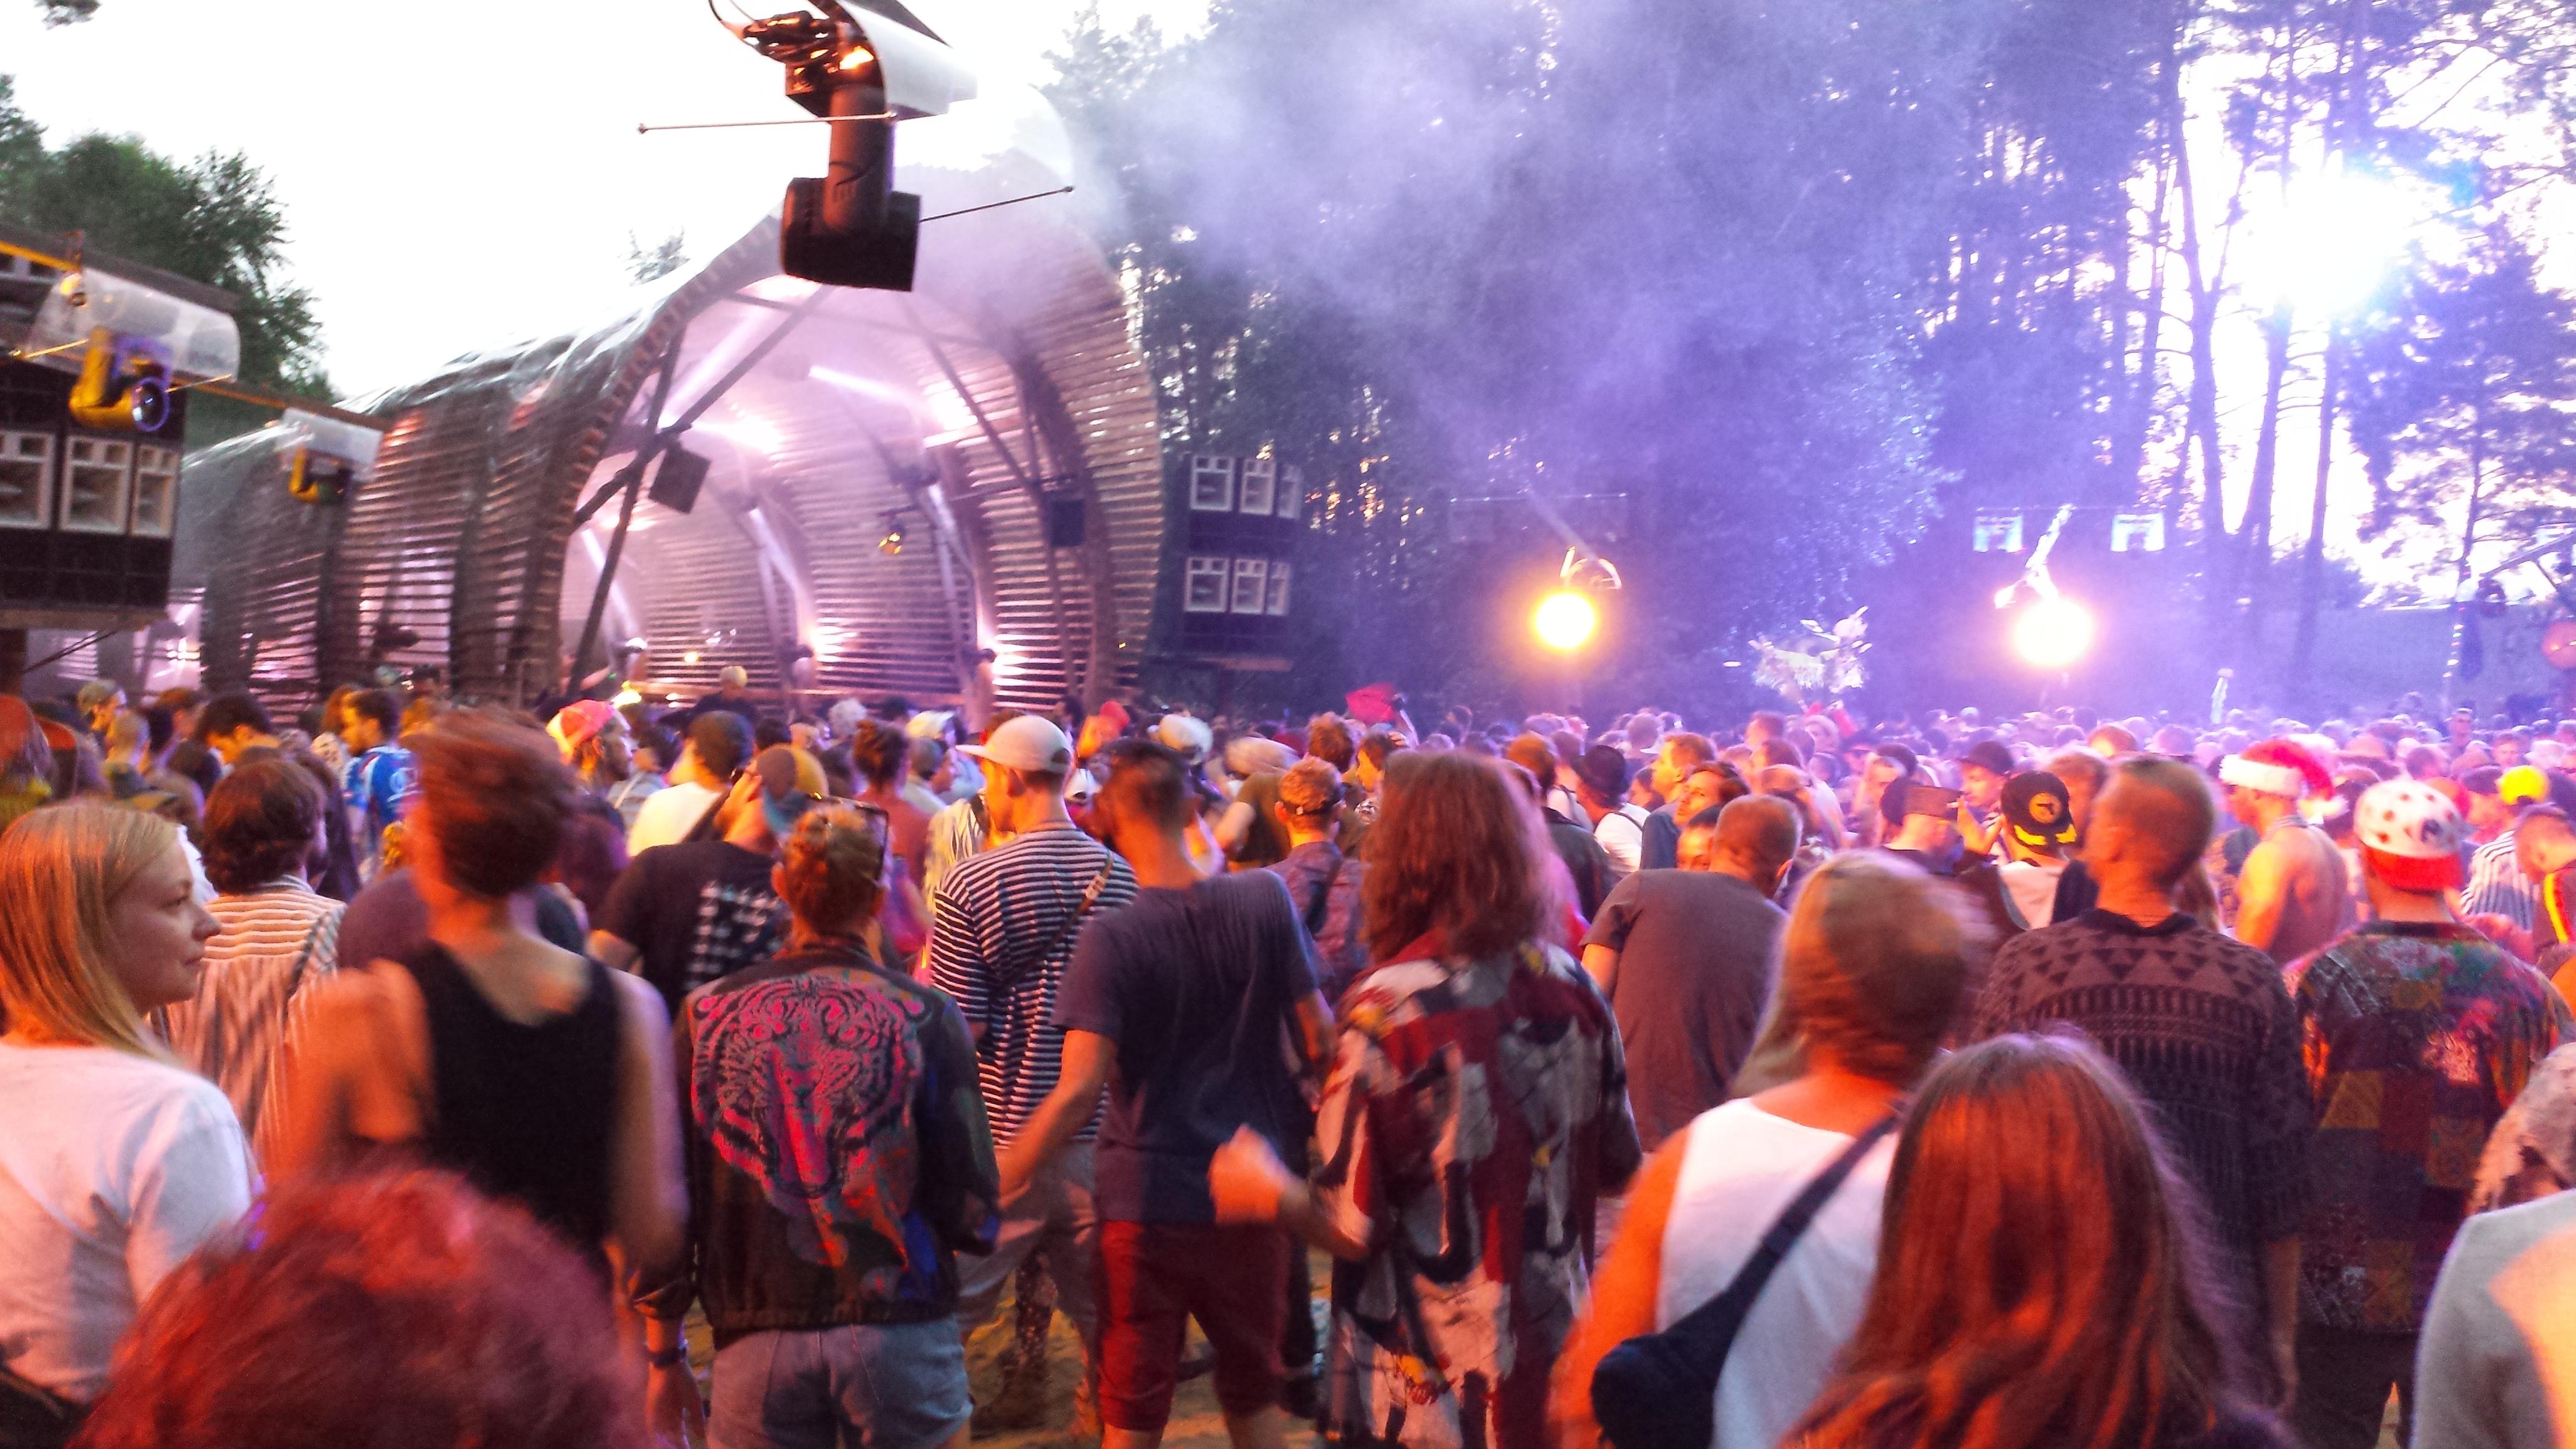 Garbicz festival 2020